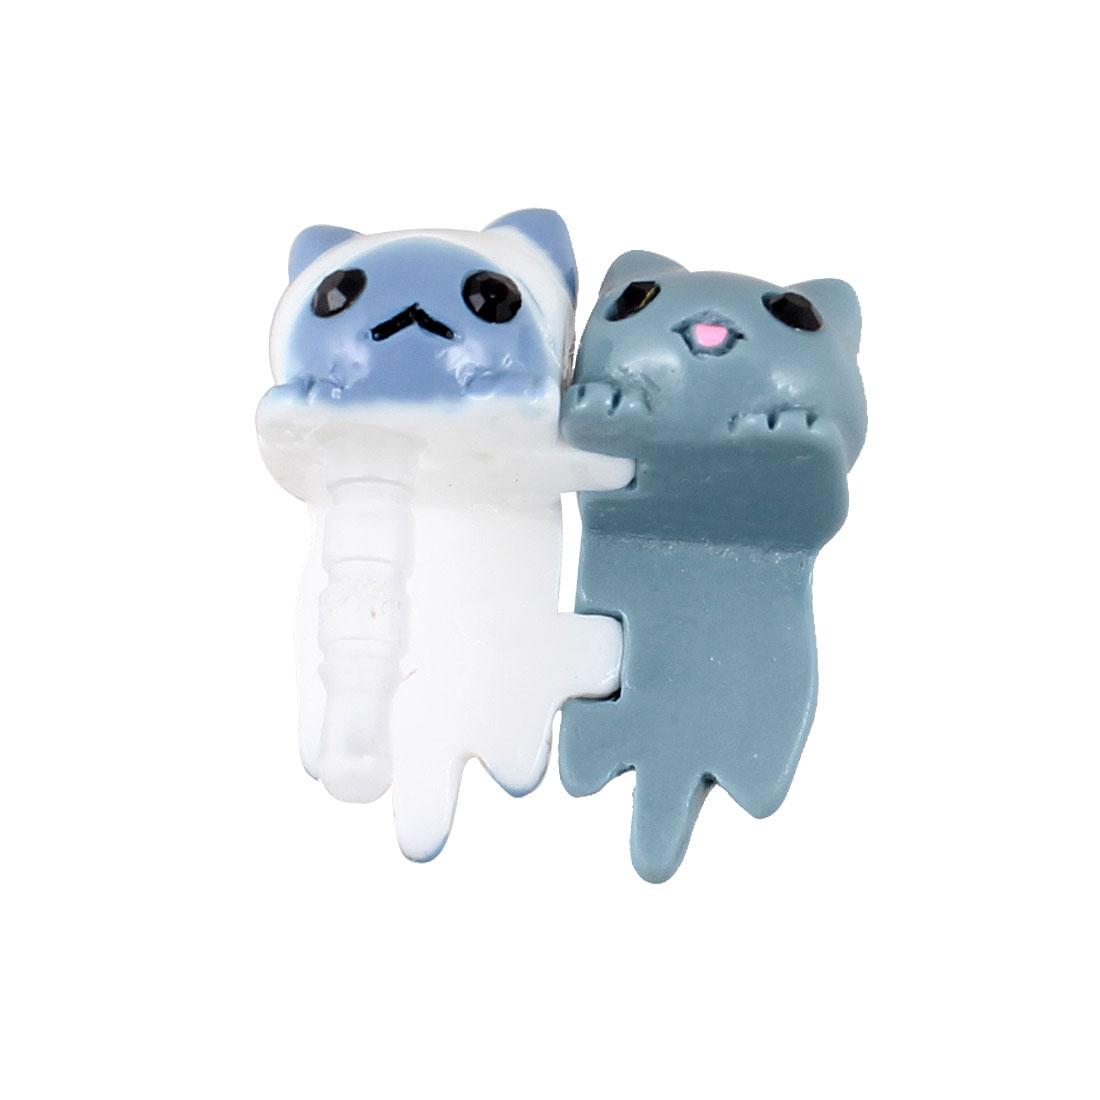 Cat Couples 3.5mm Earphone Anti Dust Cap Stopper for Smartphone